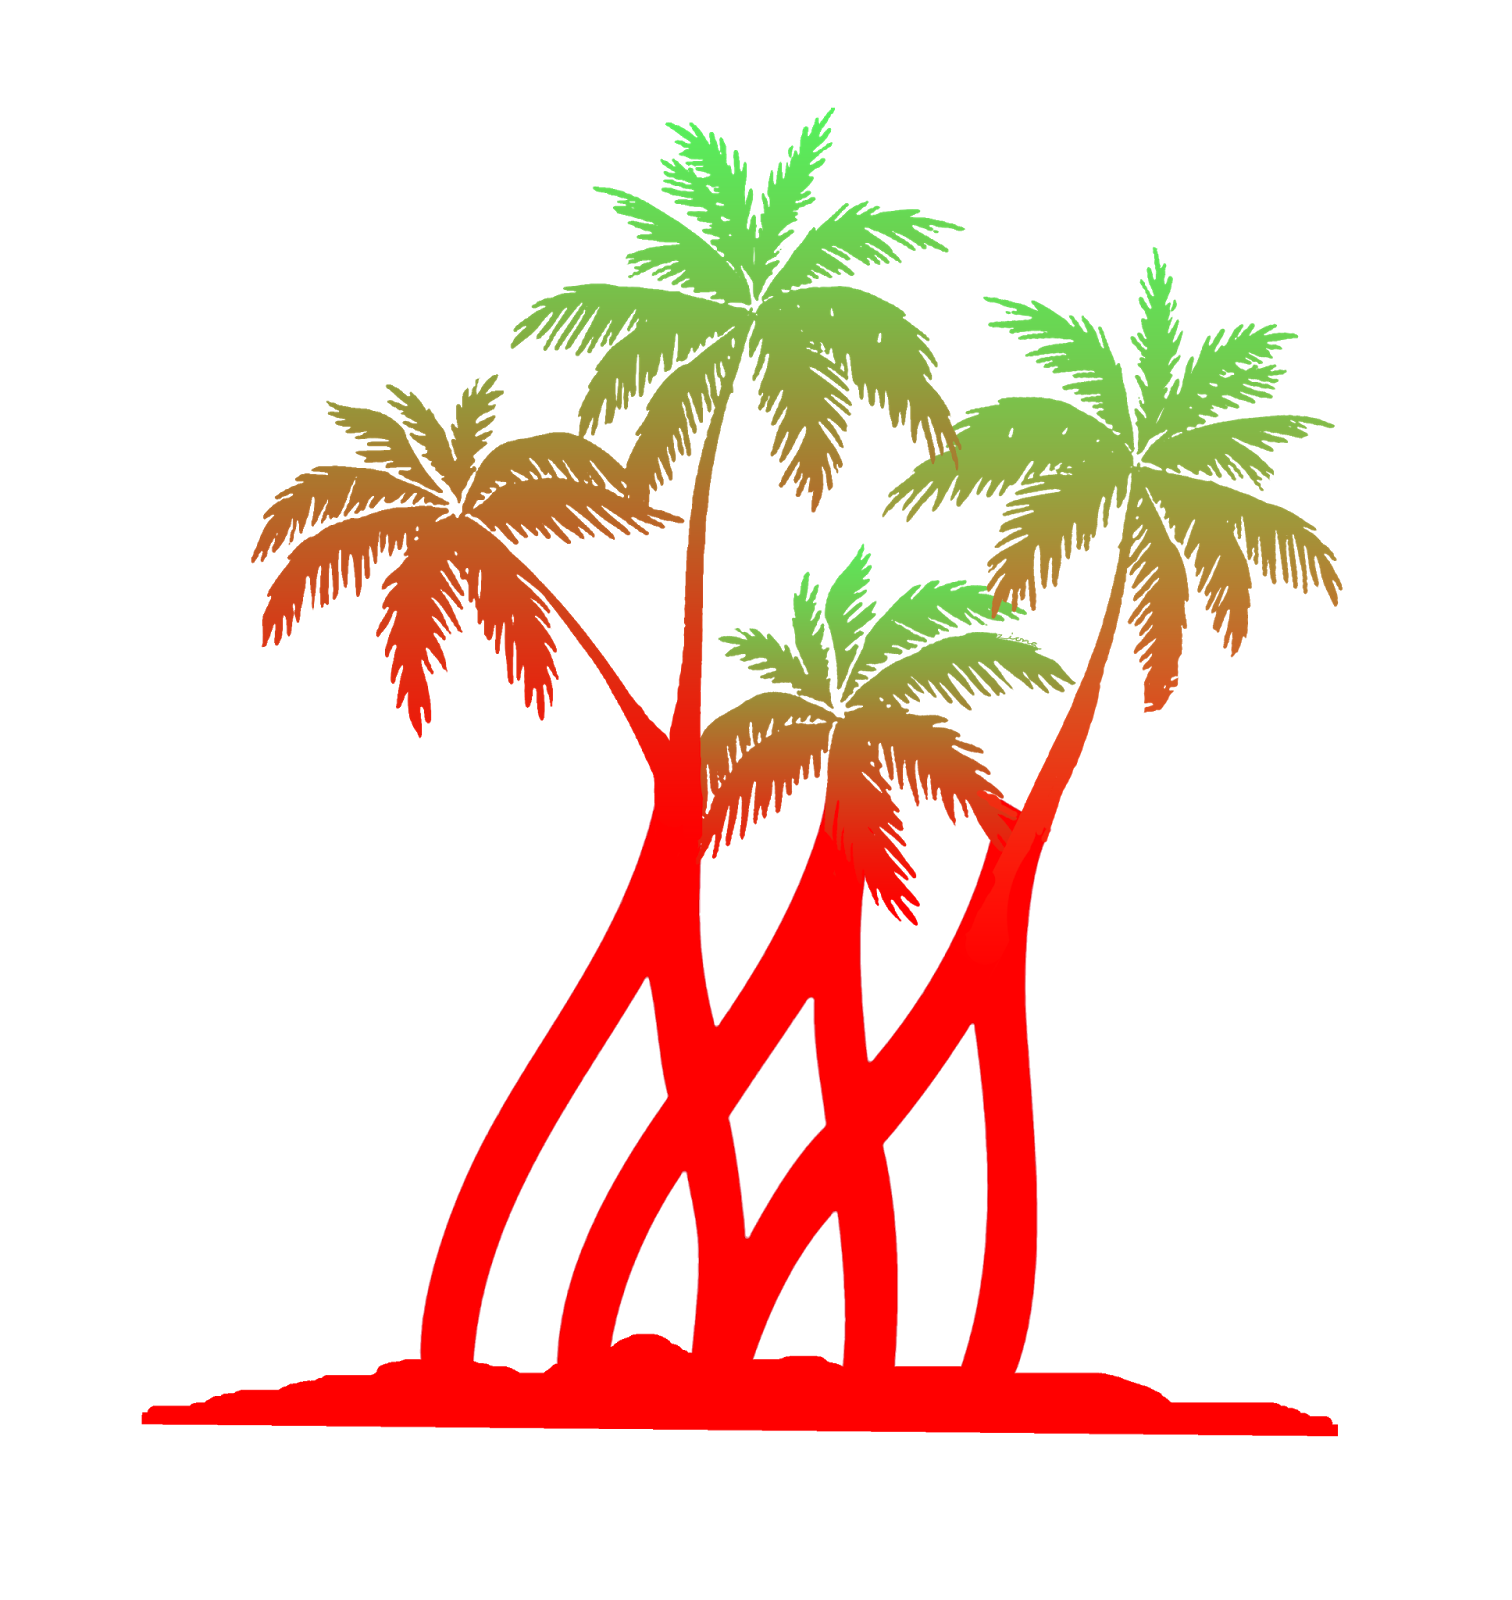 Shirt design tampa - Original Shirt Design Logo For American Marketing Association Ama The University Of Tampa 1st Place Winner